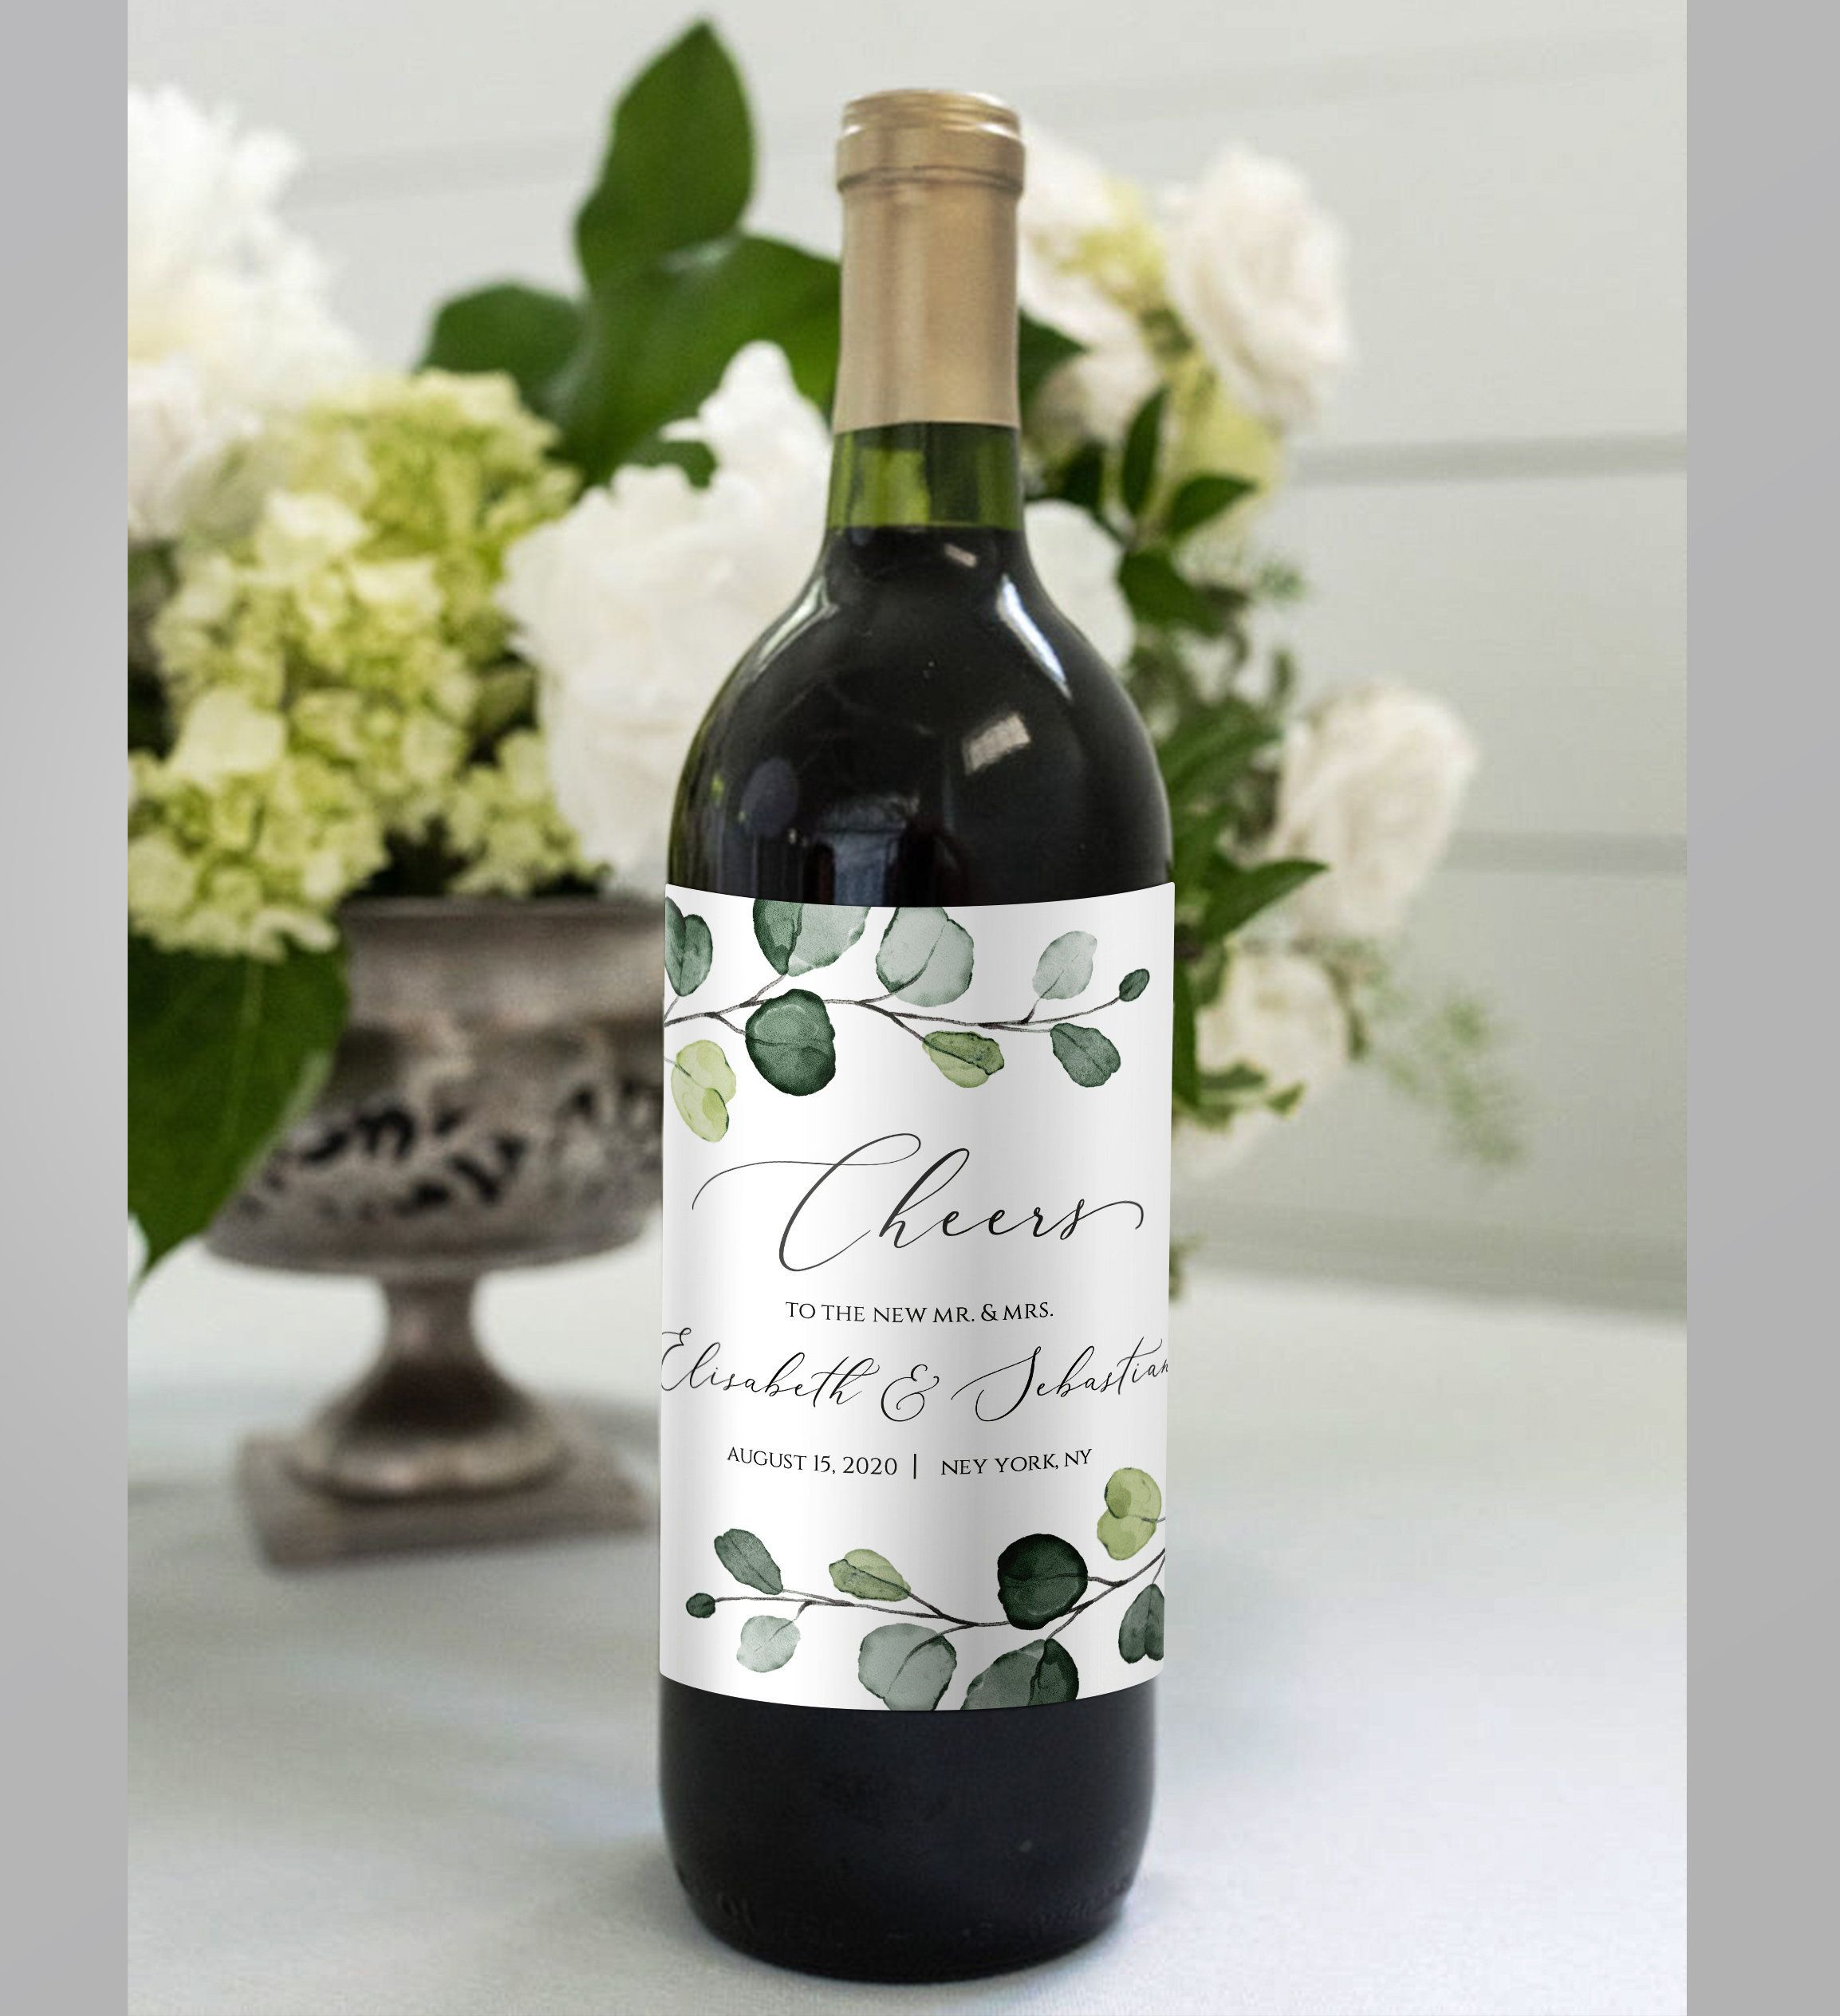 Thank You Wedding Wine Bottle Labels Favor Wine Label Editable Template Thank You Wine Label Wine Label Printable Shower Favors DIY Greenery